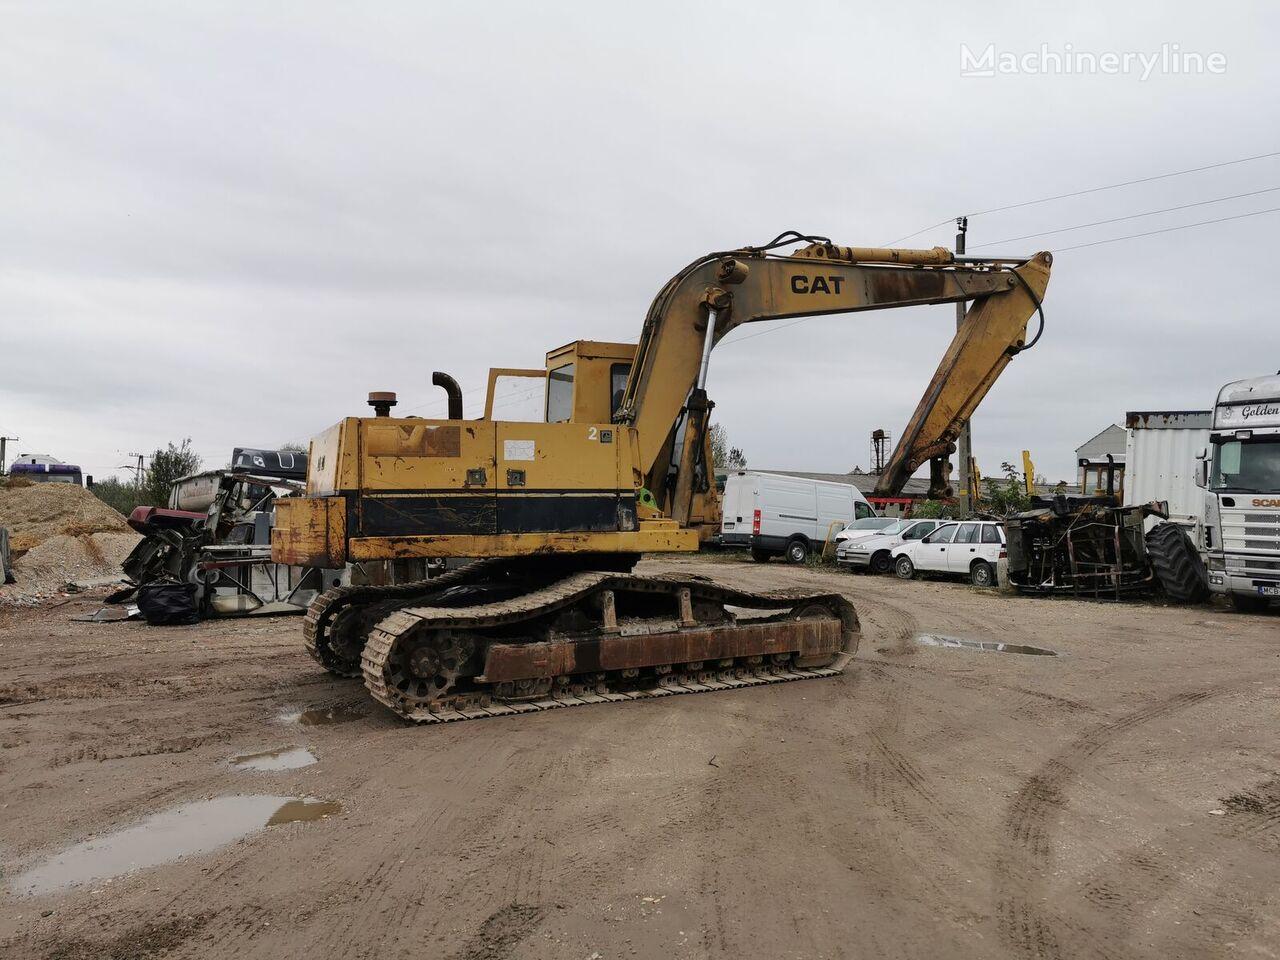 CATERPILLAR 219 LC tracked excavator